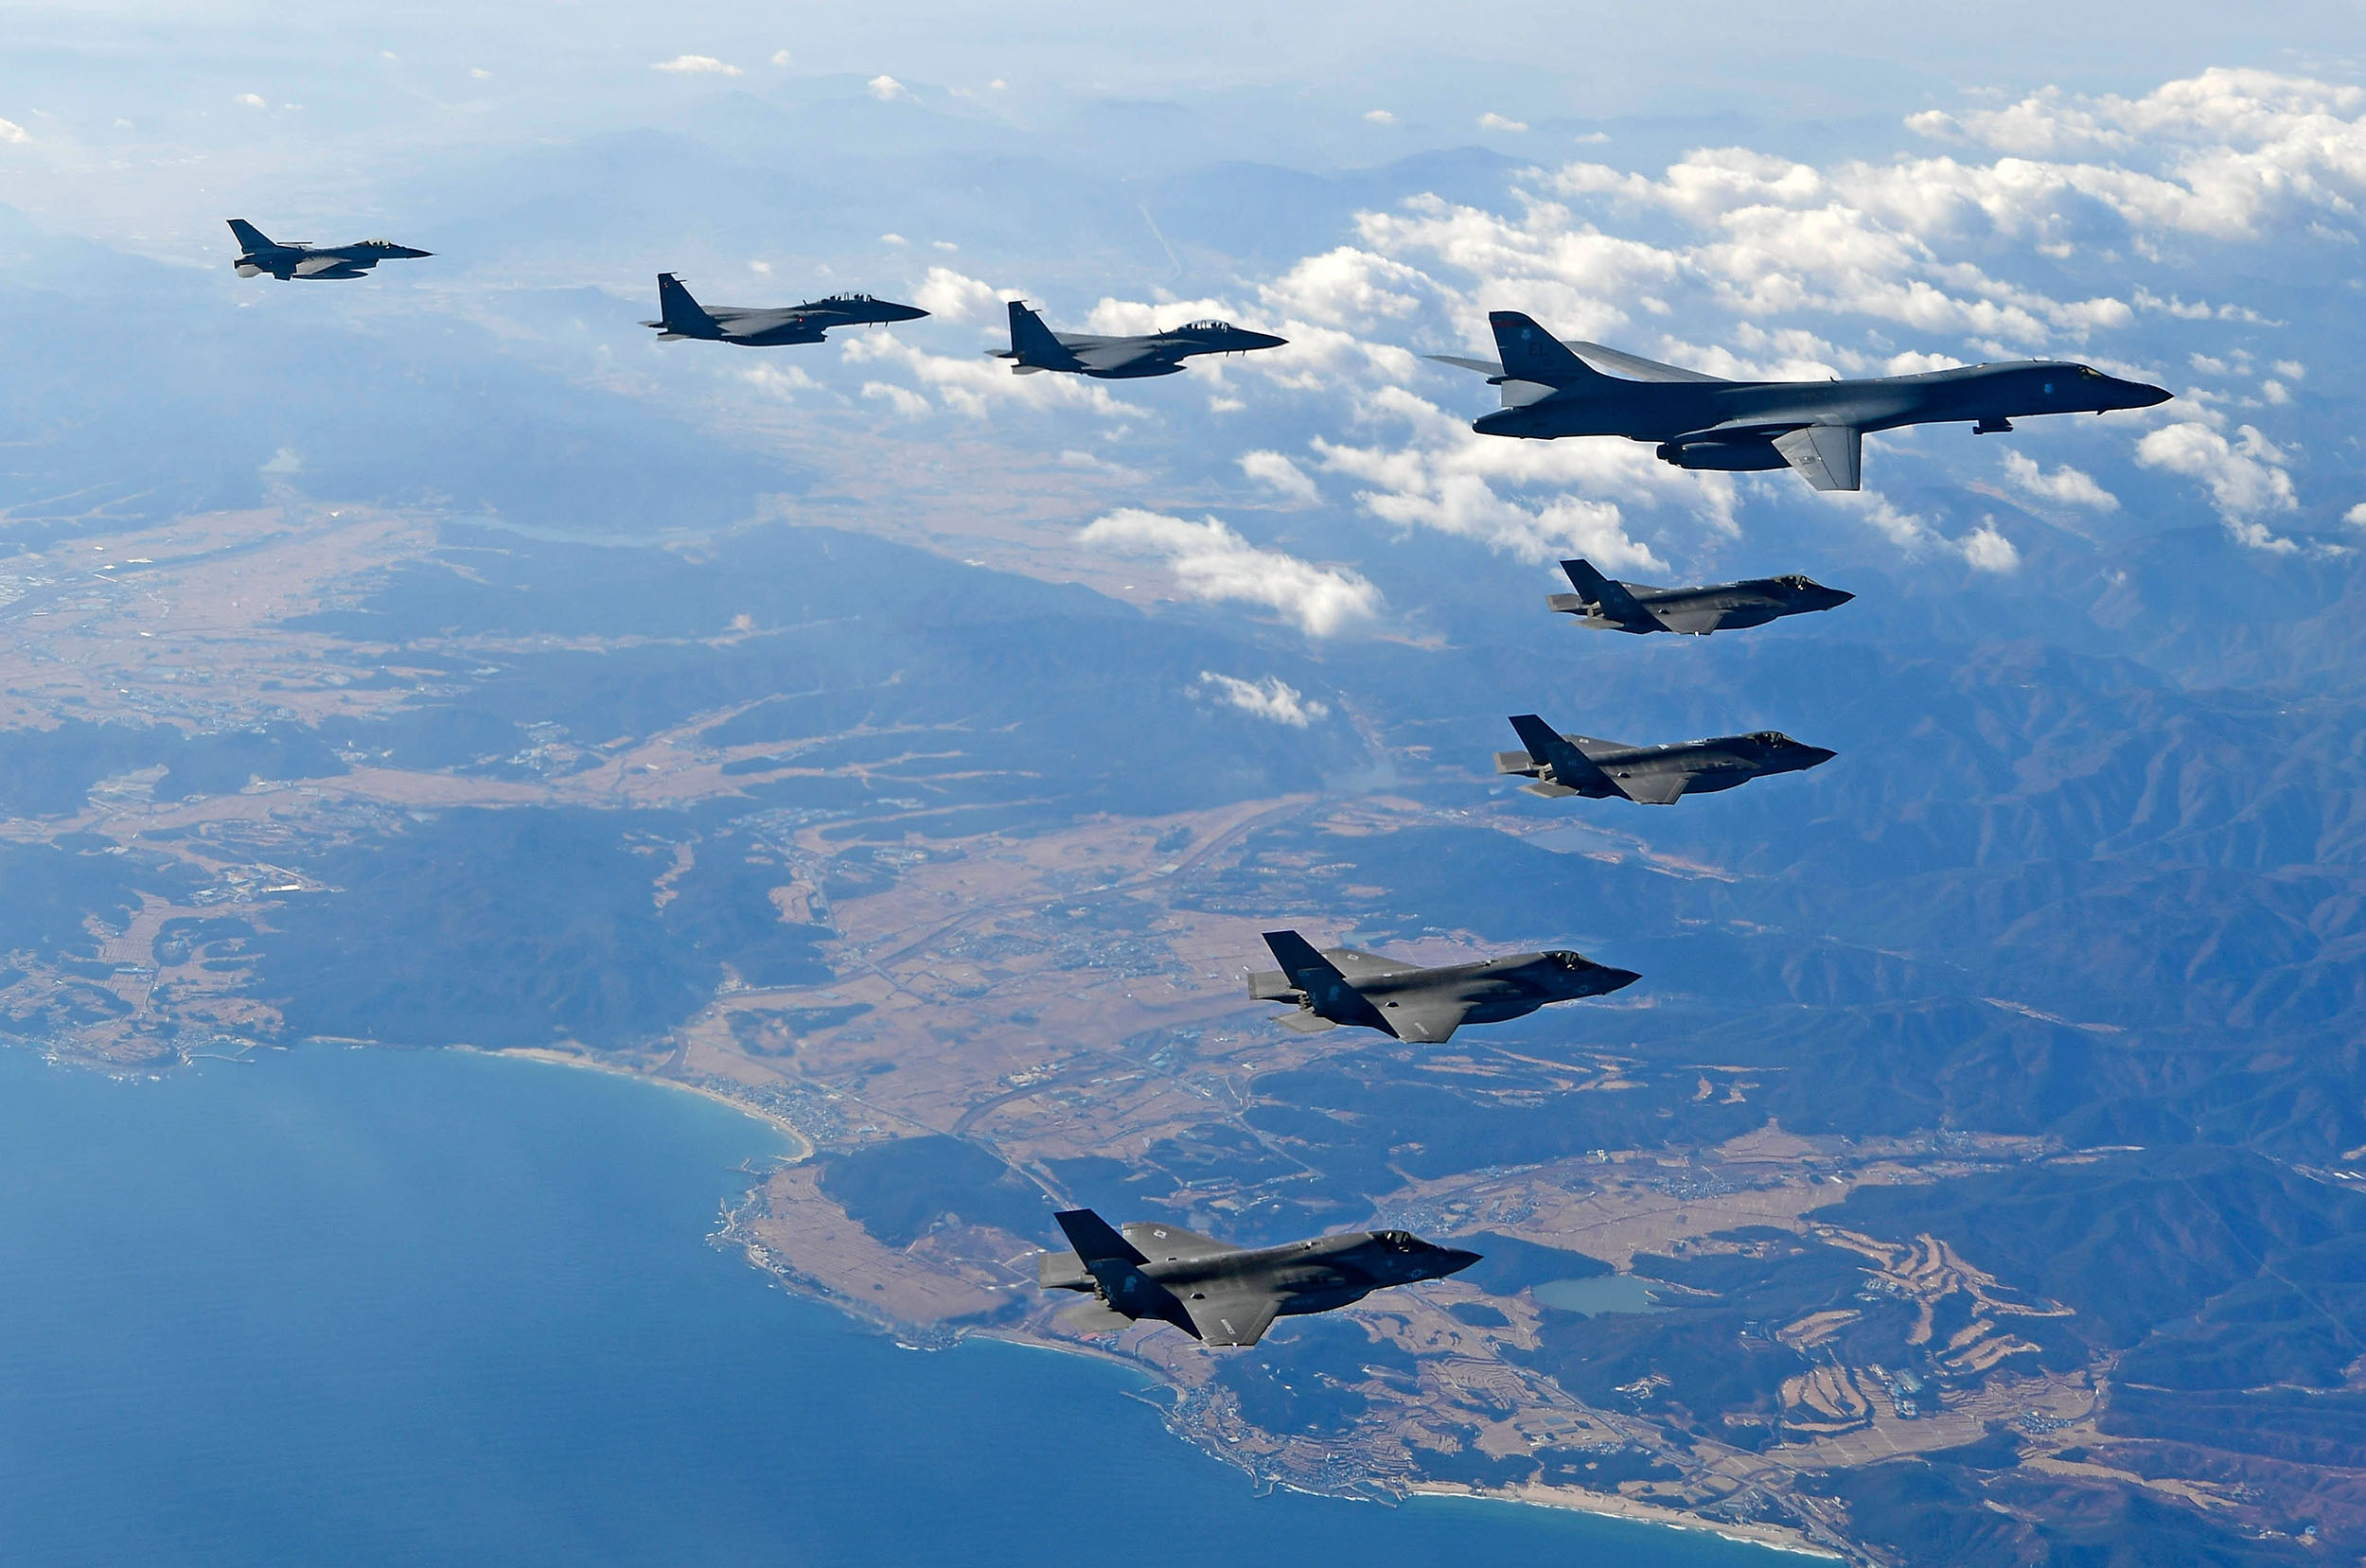 North-Korea-says-war-with-the-U.S.-is-inevitable